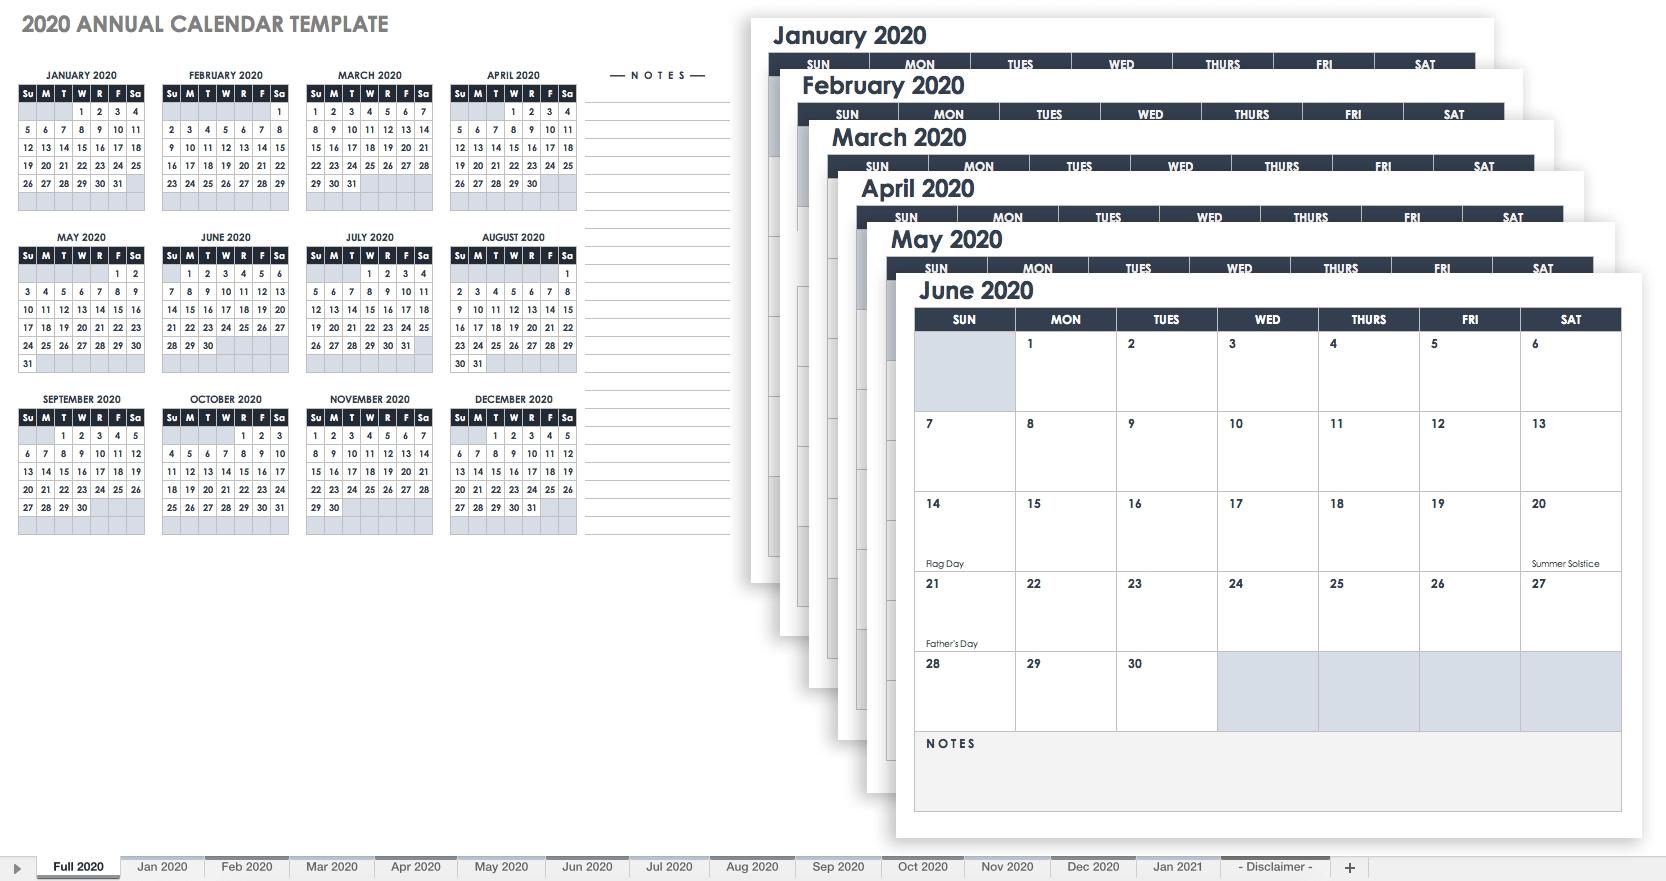 Free, Printable Excel Calendar Templates For 2019 & On | Smartsheet regarding Print A Blank Spreadsheet 7 Rows